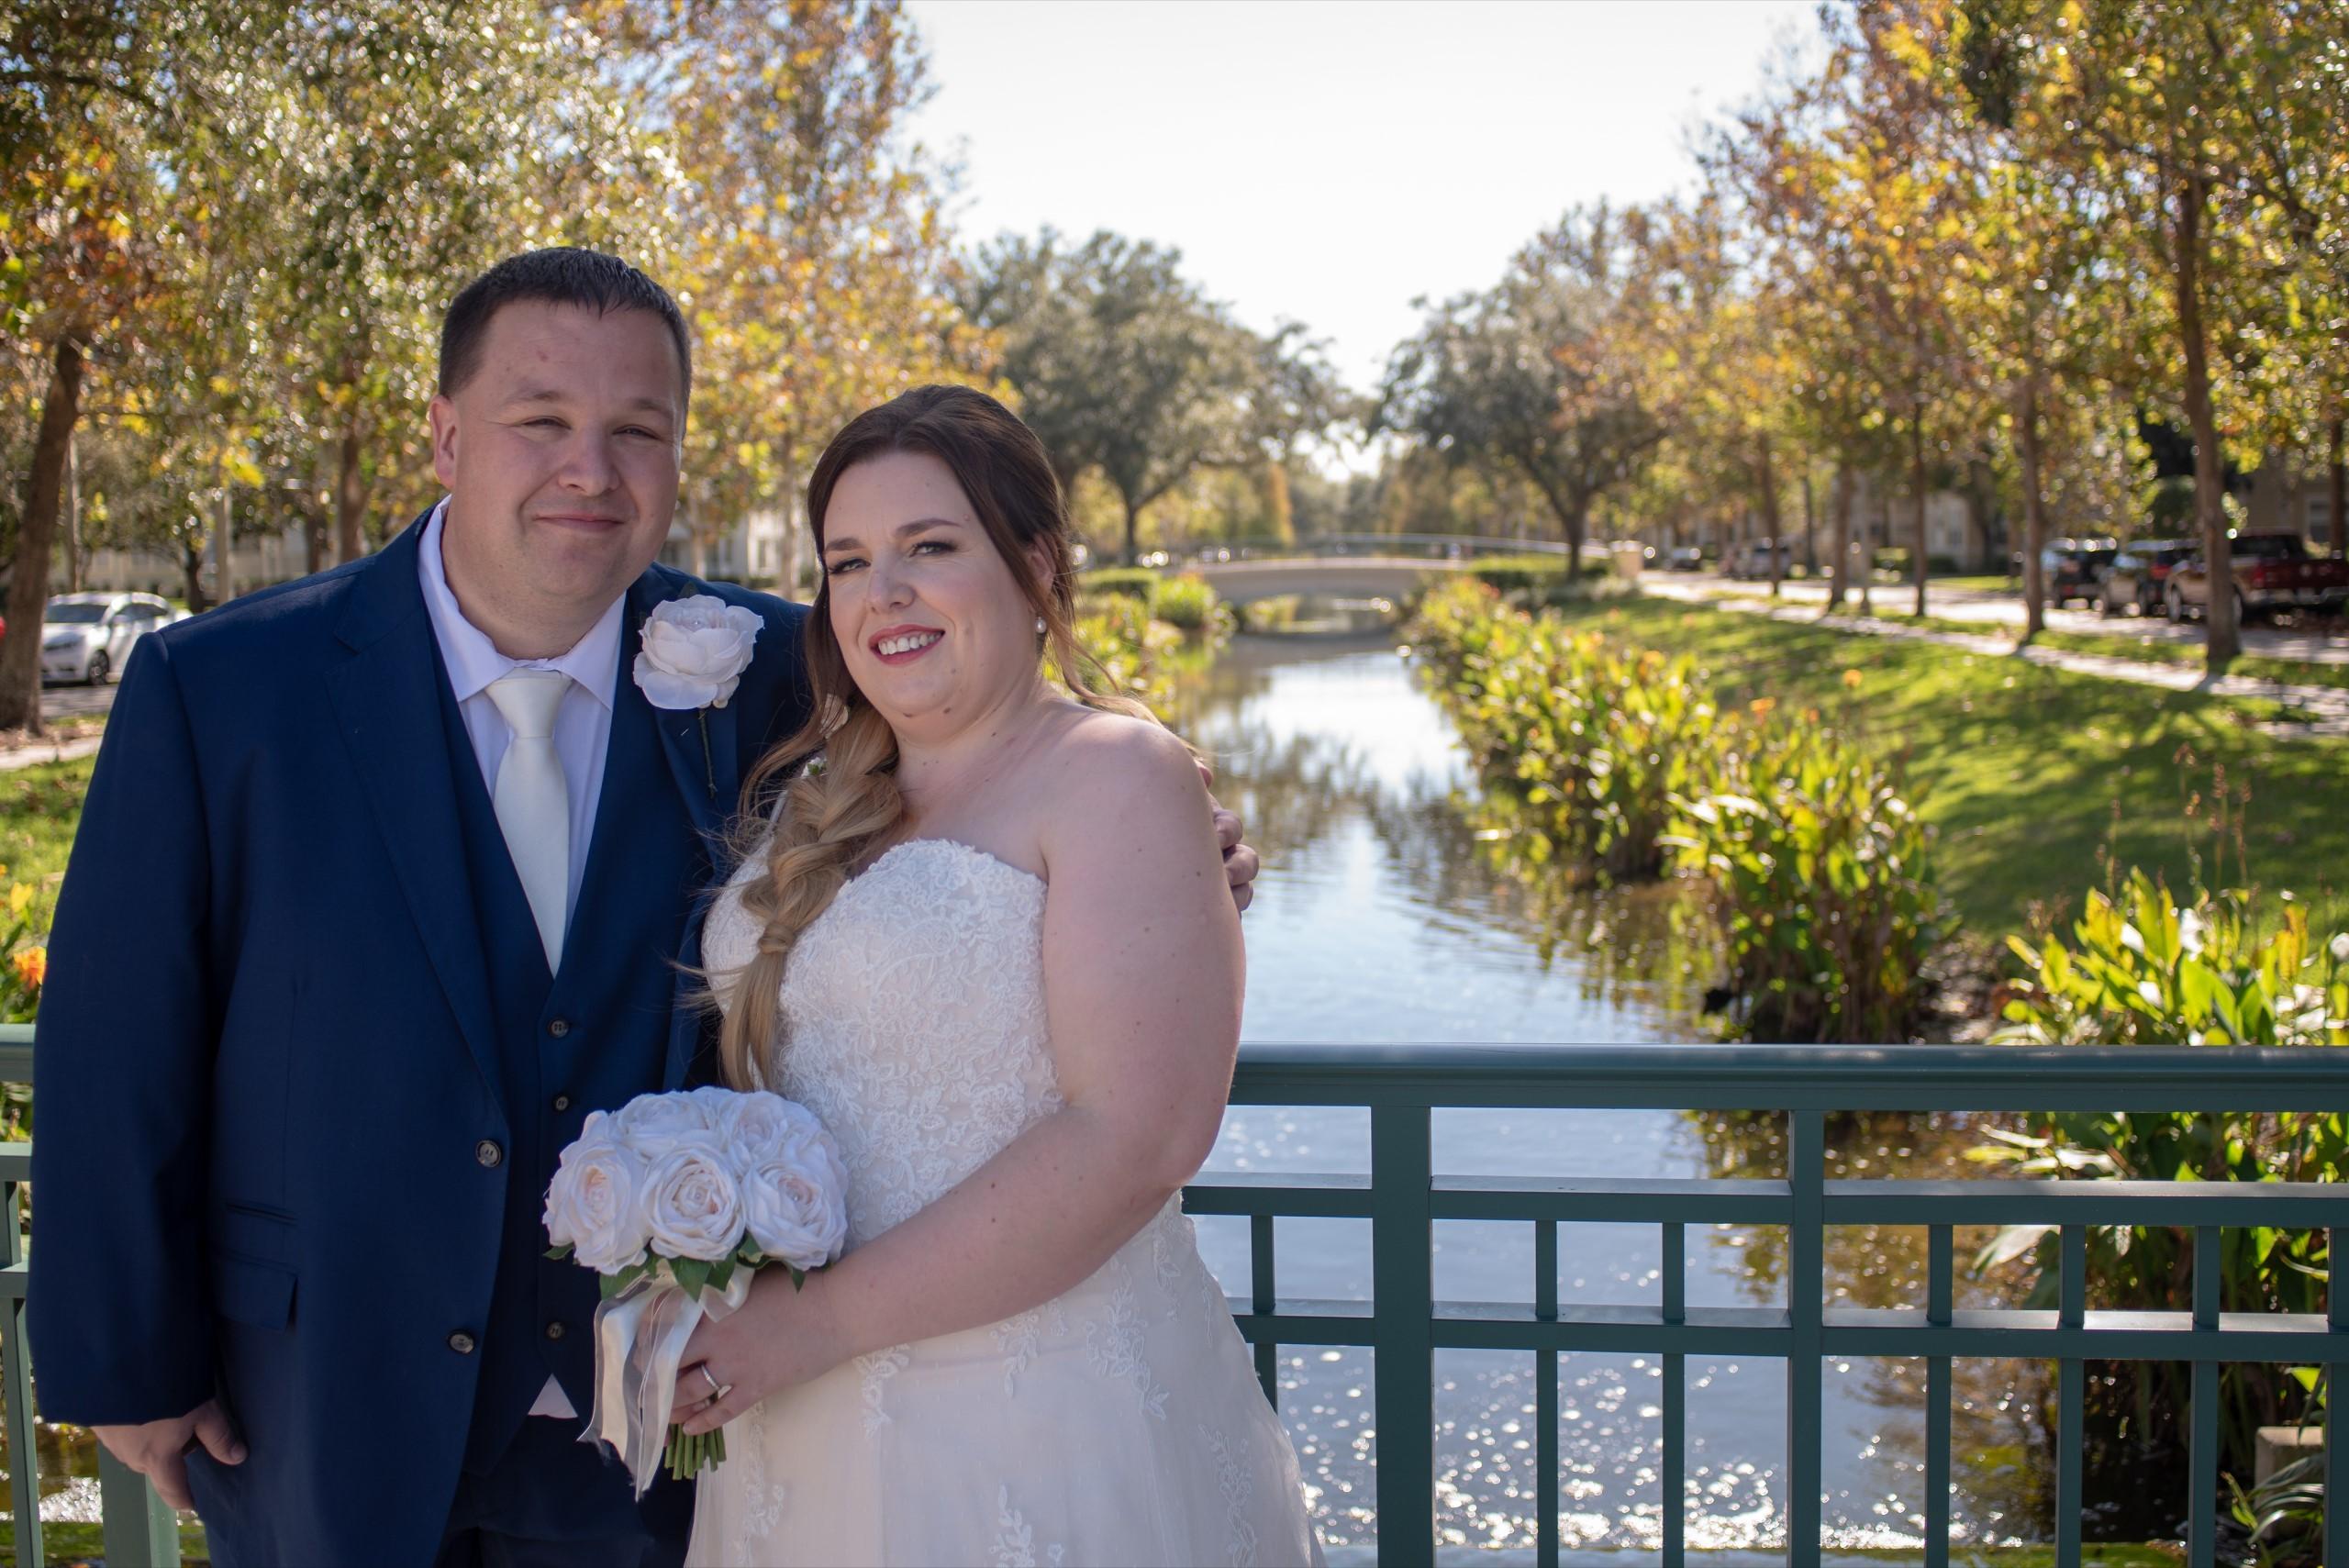 Celebration Golf Club | The Real Wedding of Sarah and John